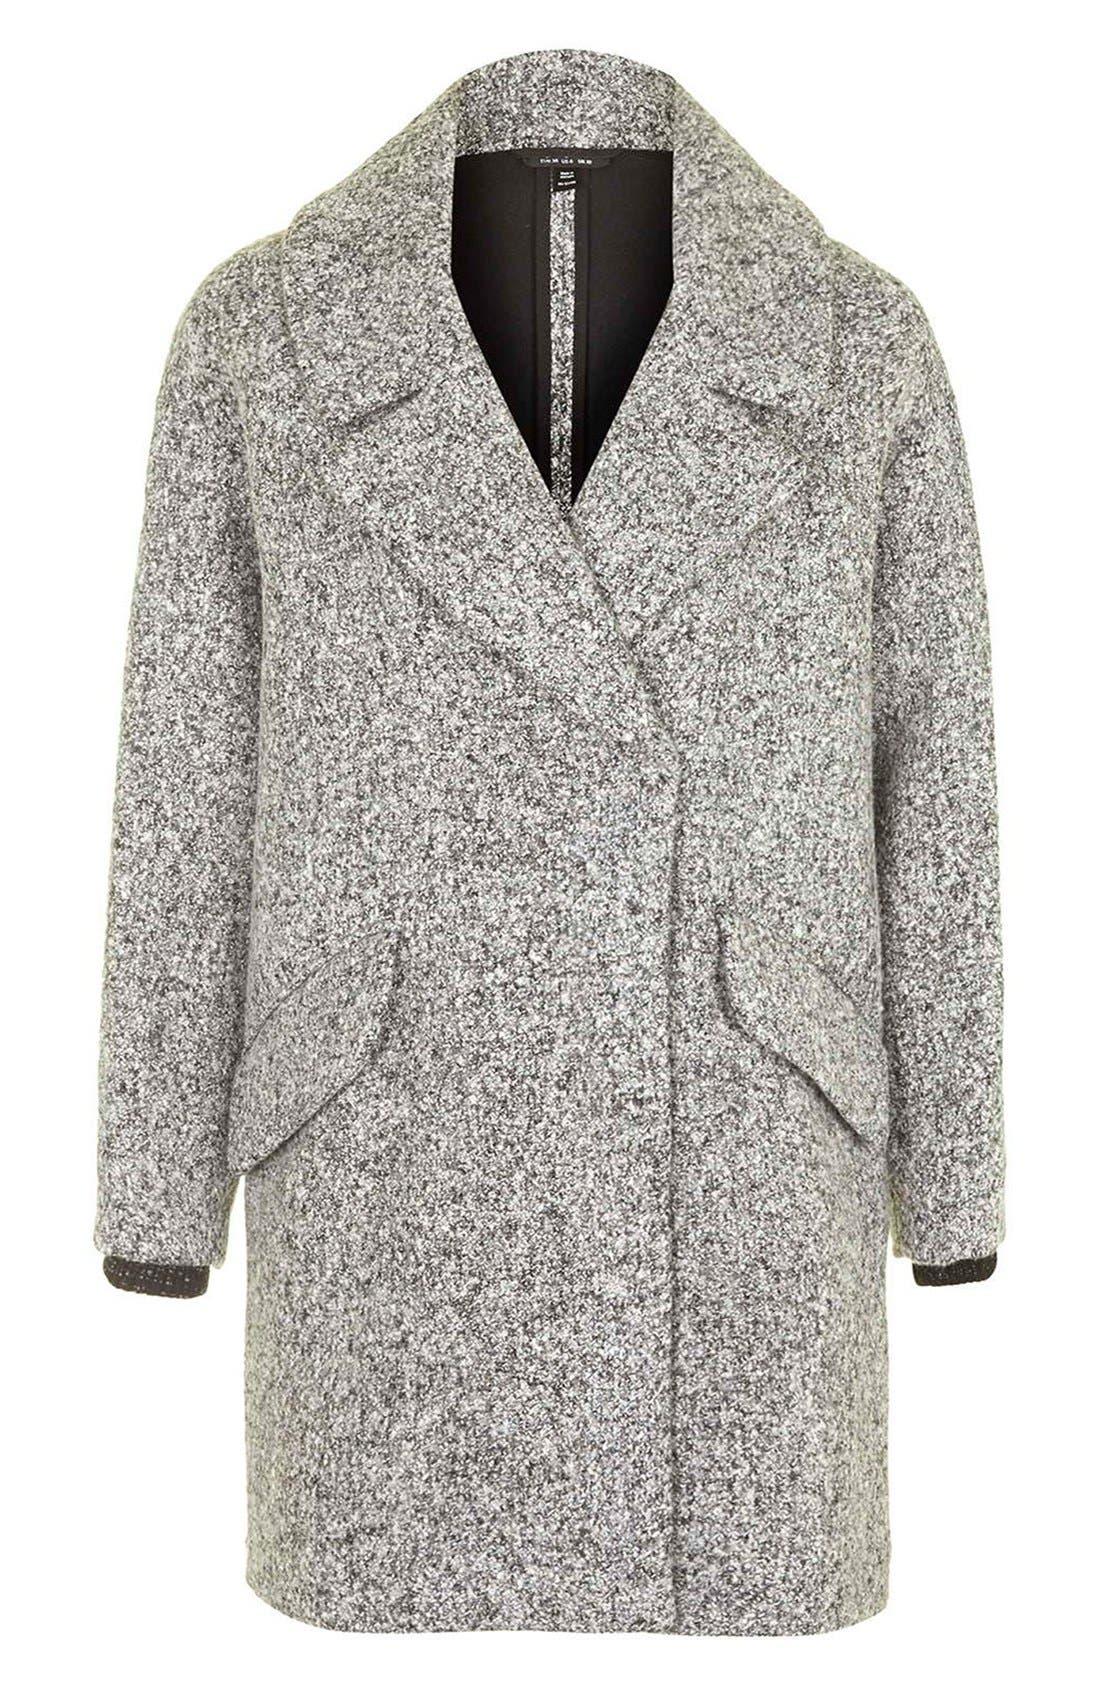 TOPSHOP, 'Amelia' Slouch Coat, Alternate thumbnail 2, color, 020